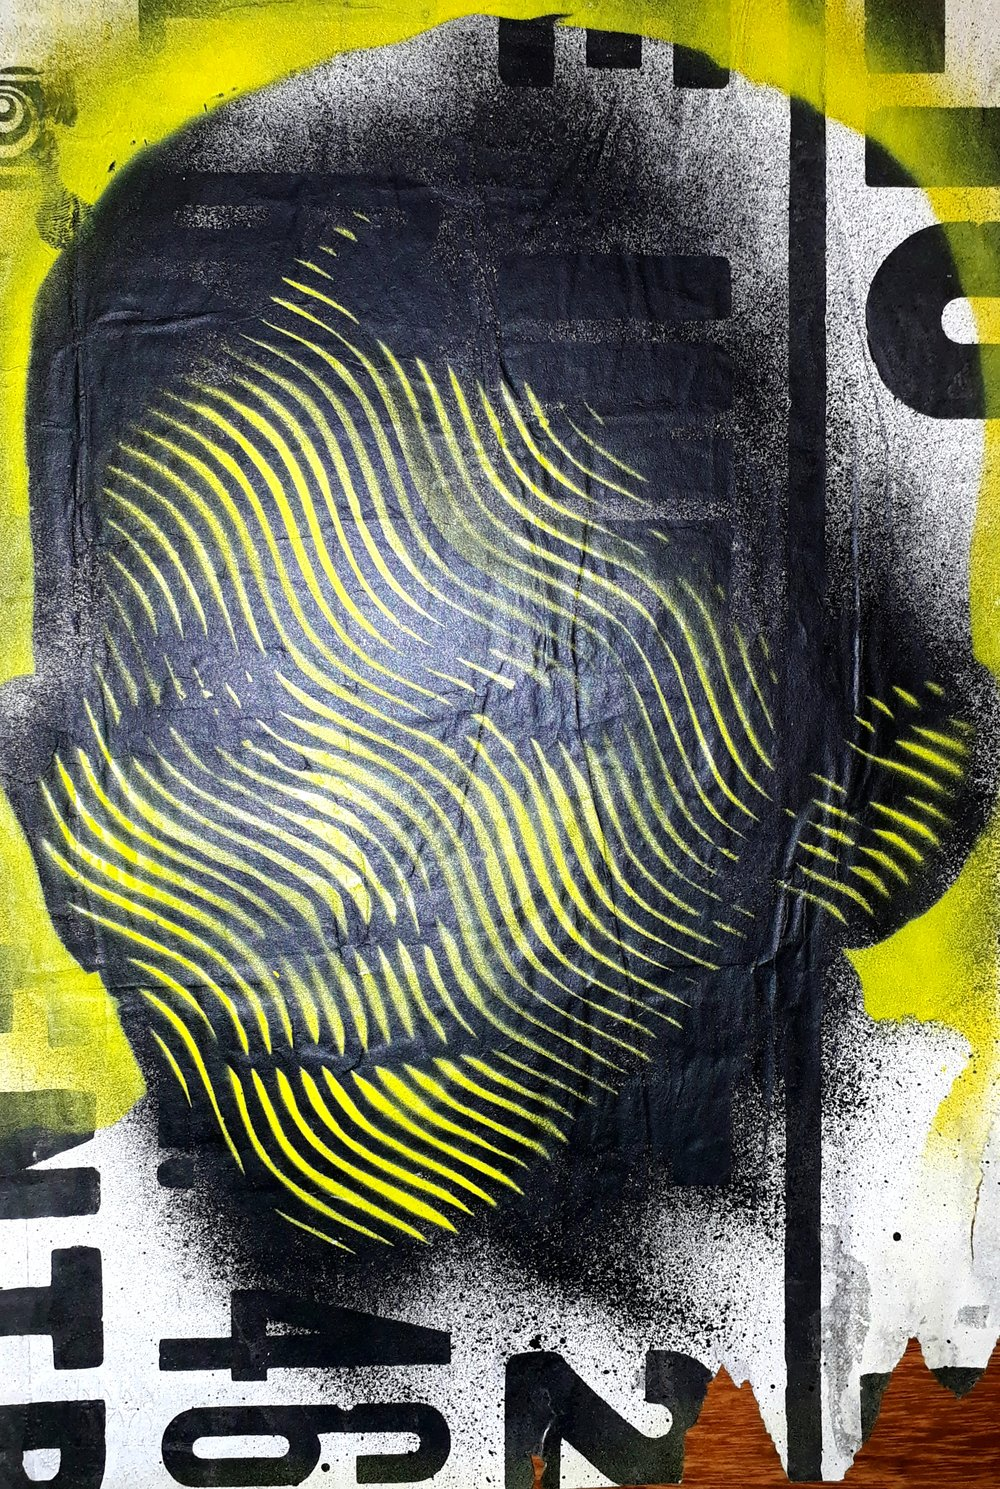 S.T (2018) - 34.5 x 24.5 cm - Stencil y pintura en aerosol sobre Cartel / Stencil and spray paint on found poster